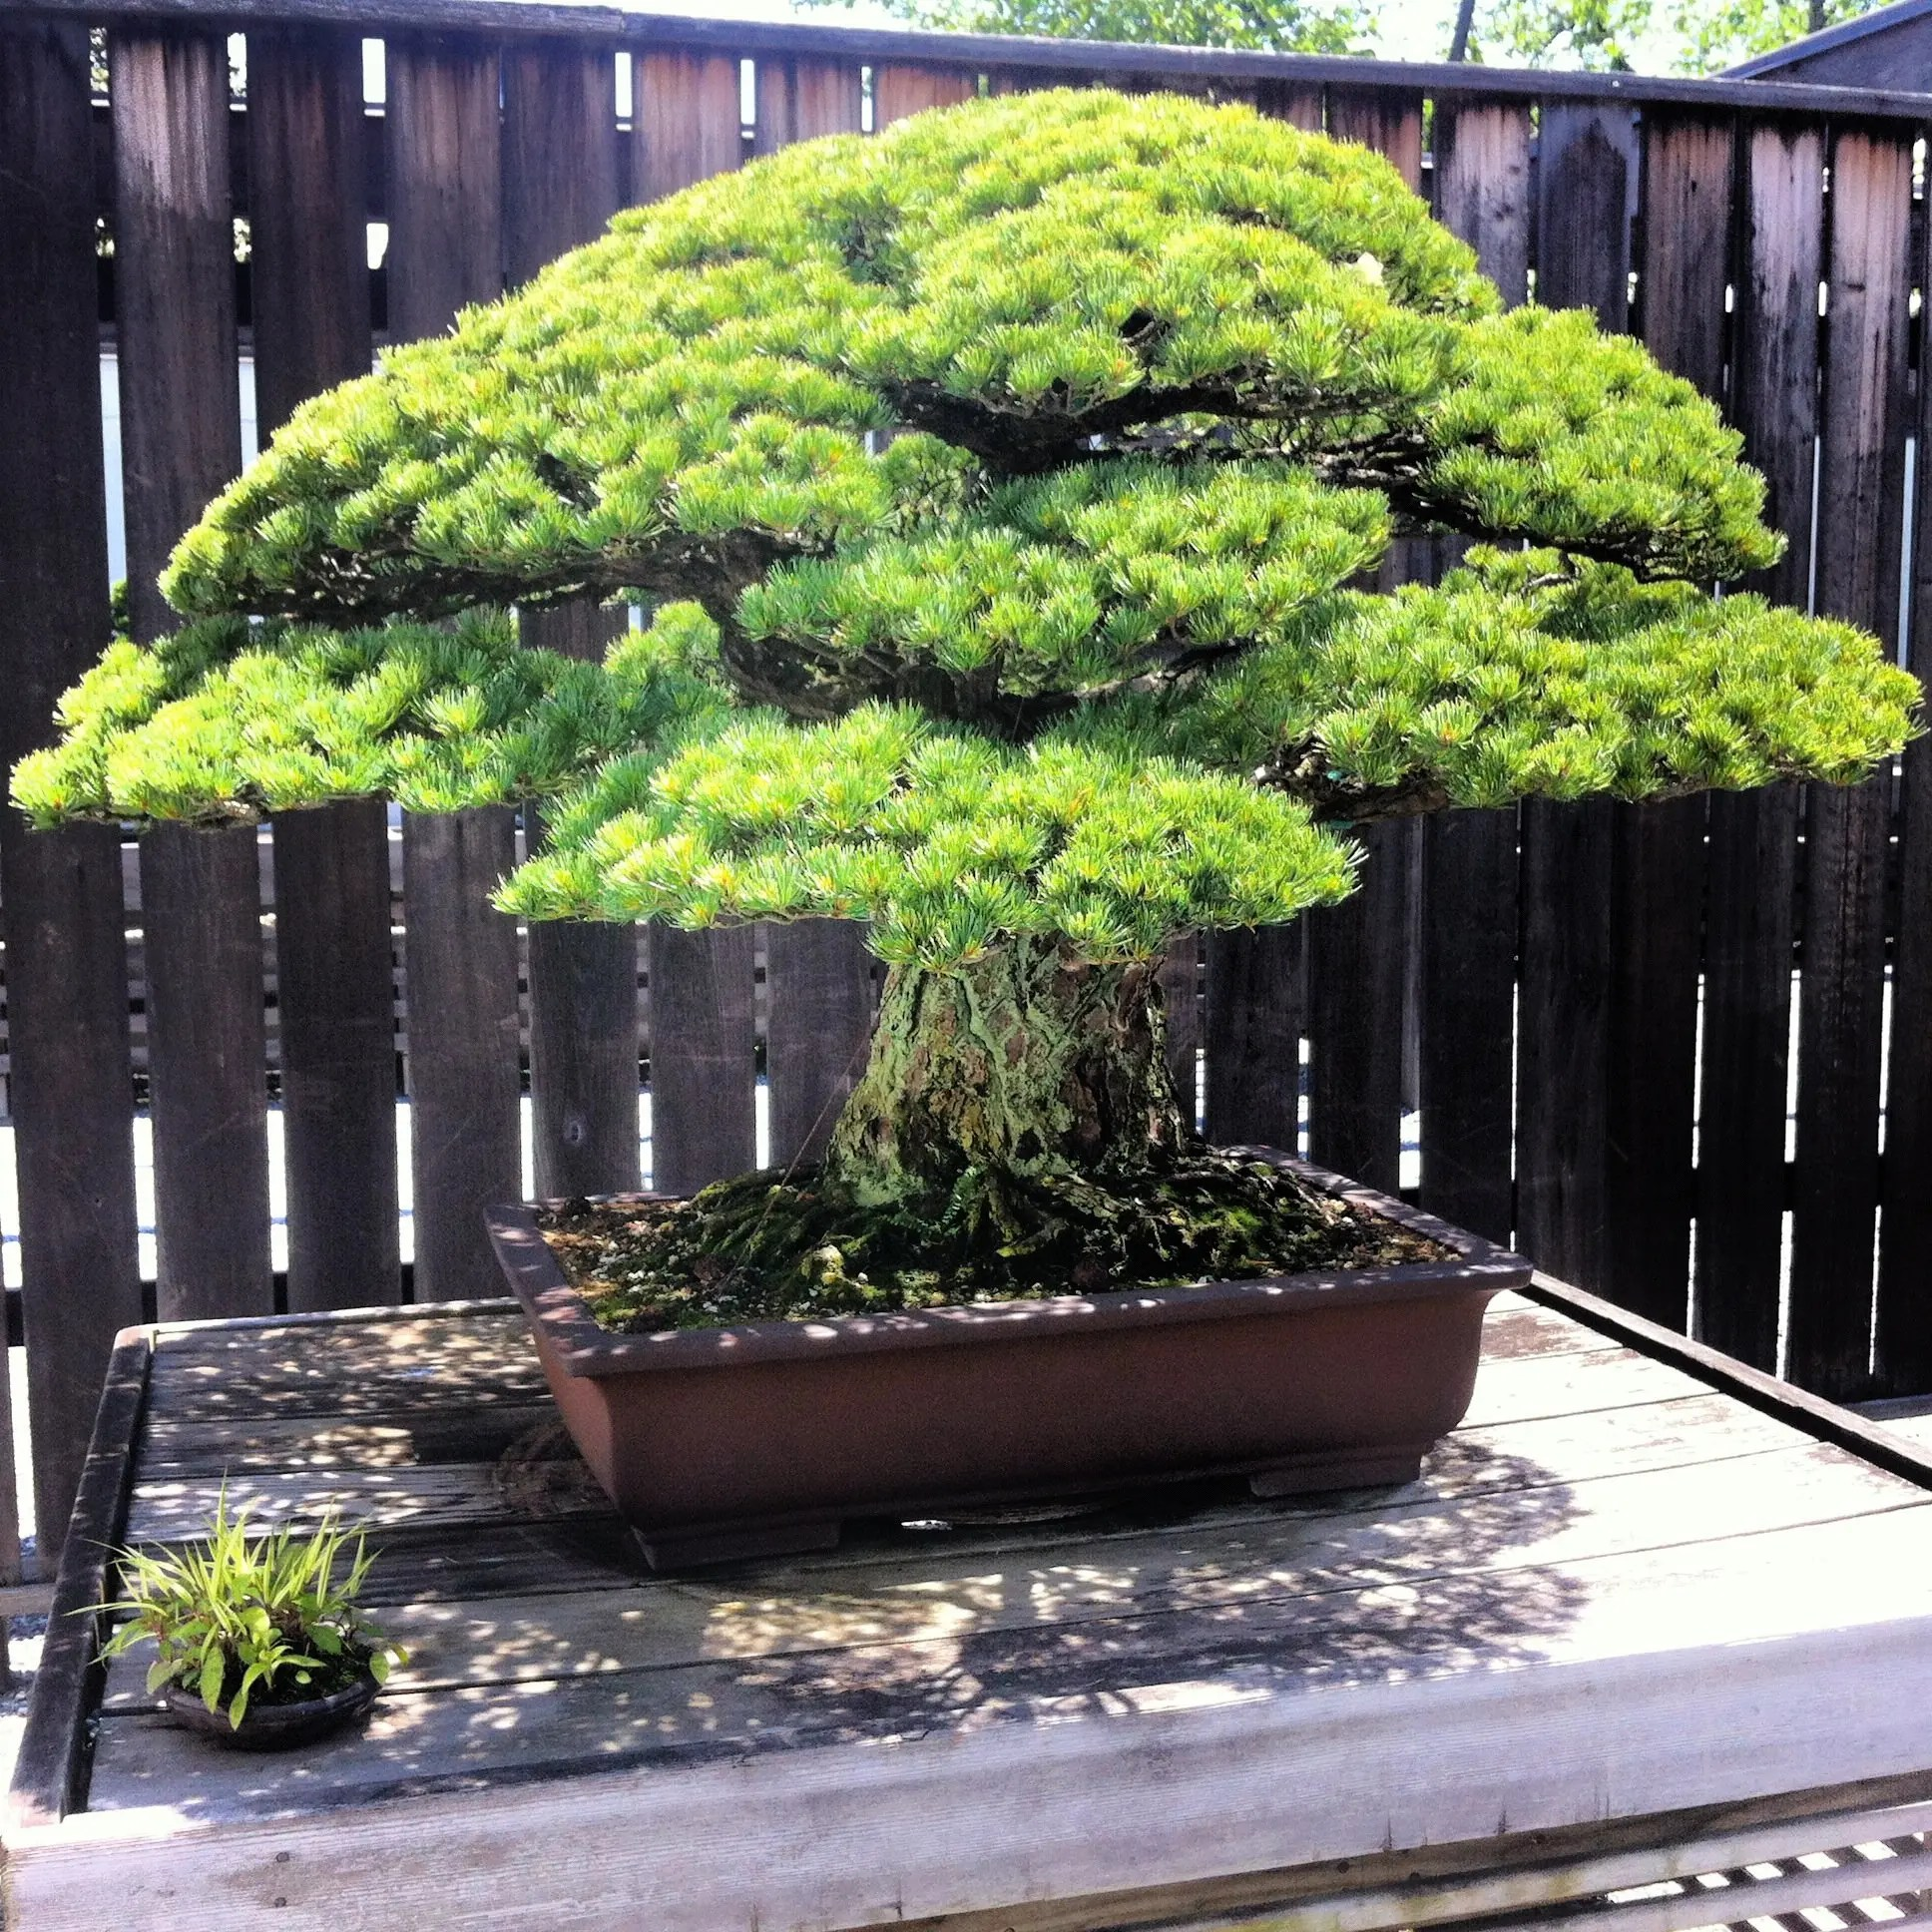 Photos: The National Arboretum and Bonsai Museum